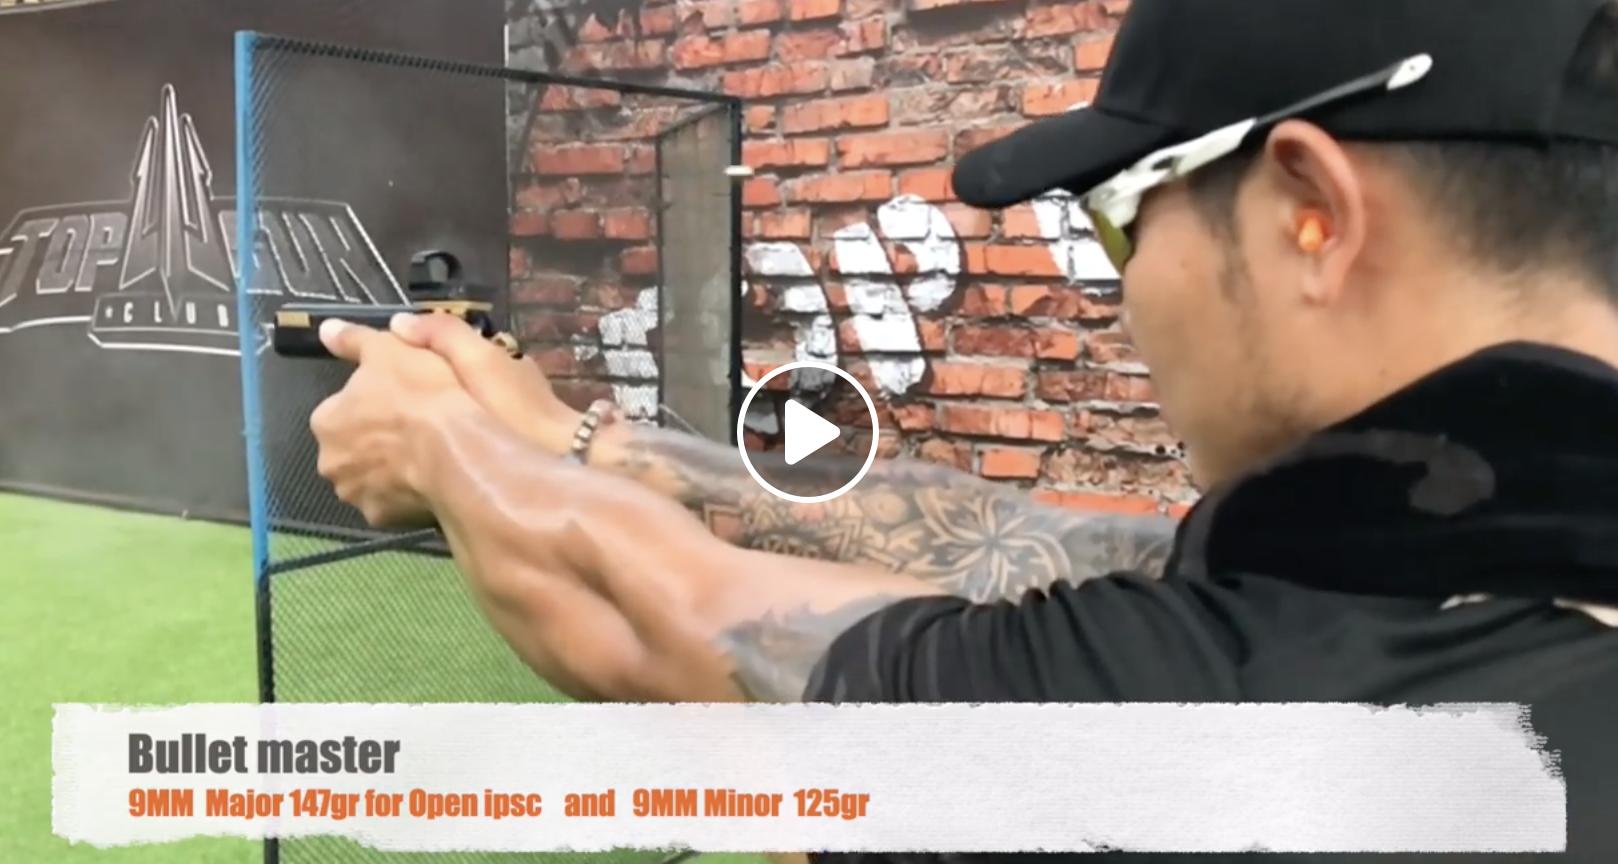 New Bullet 9MM Major 147gr and 9 MM Minor 125gr